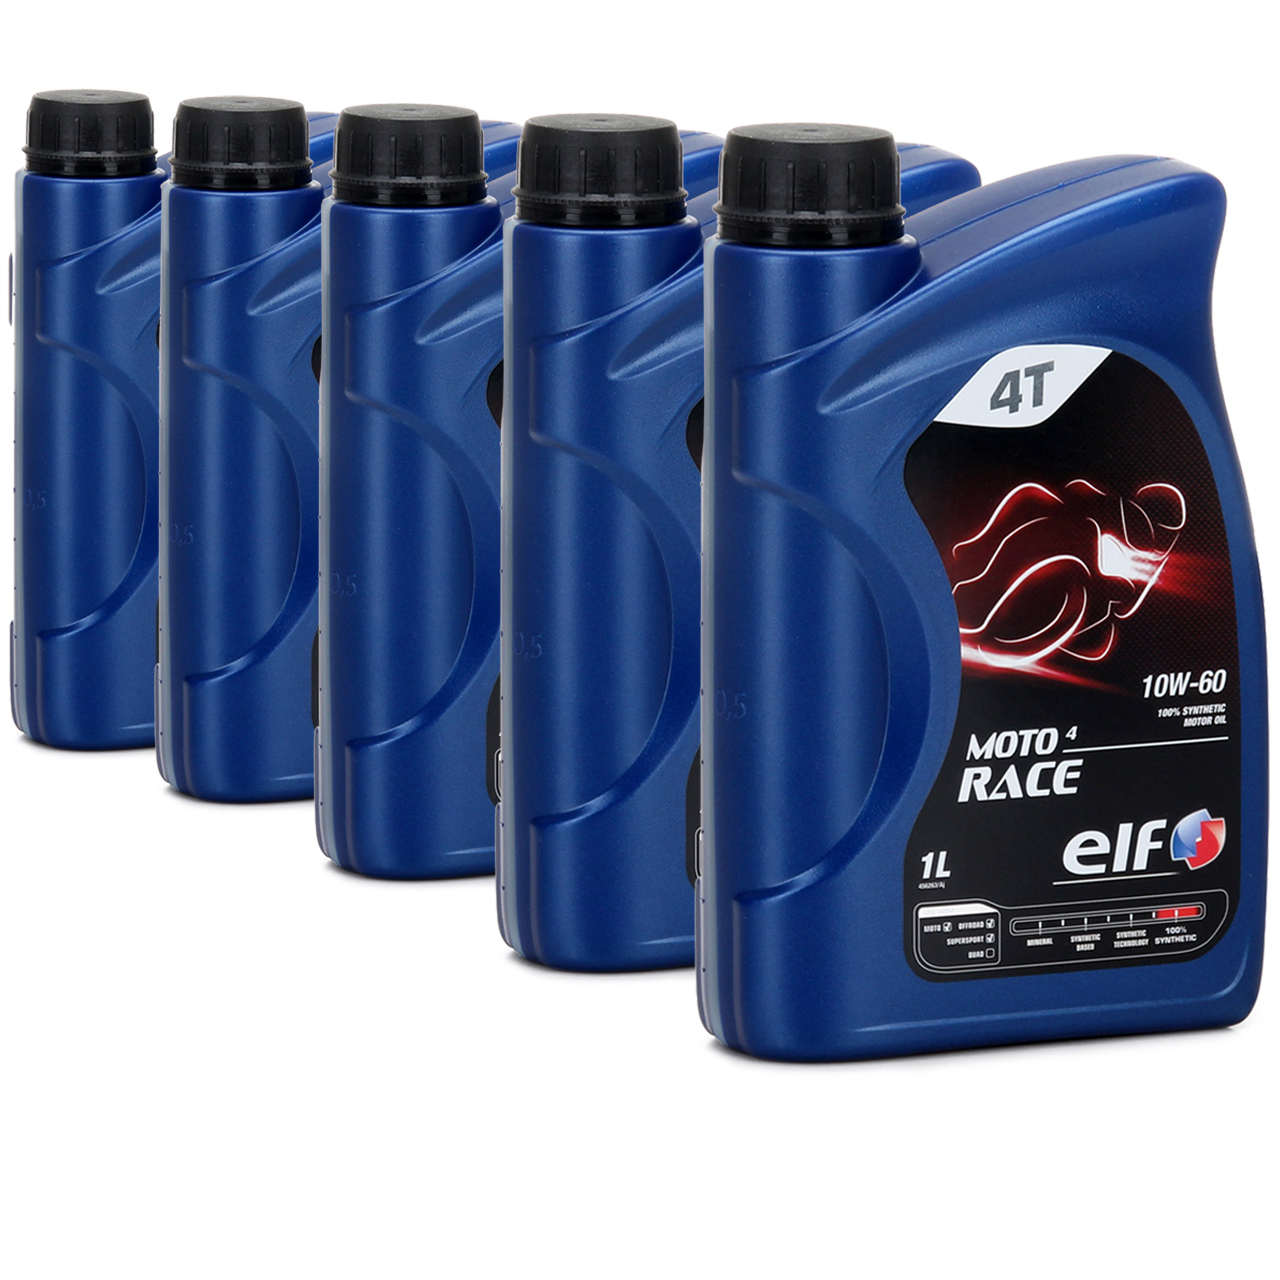 ELF Motoröl ÖL 4T 4-TAKT MOTO 4 RACE 10W-60 10W60 API SN JASO MA2 - 5L 5 Liter